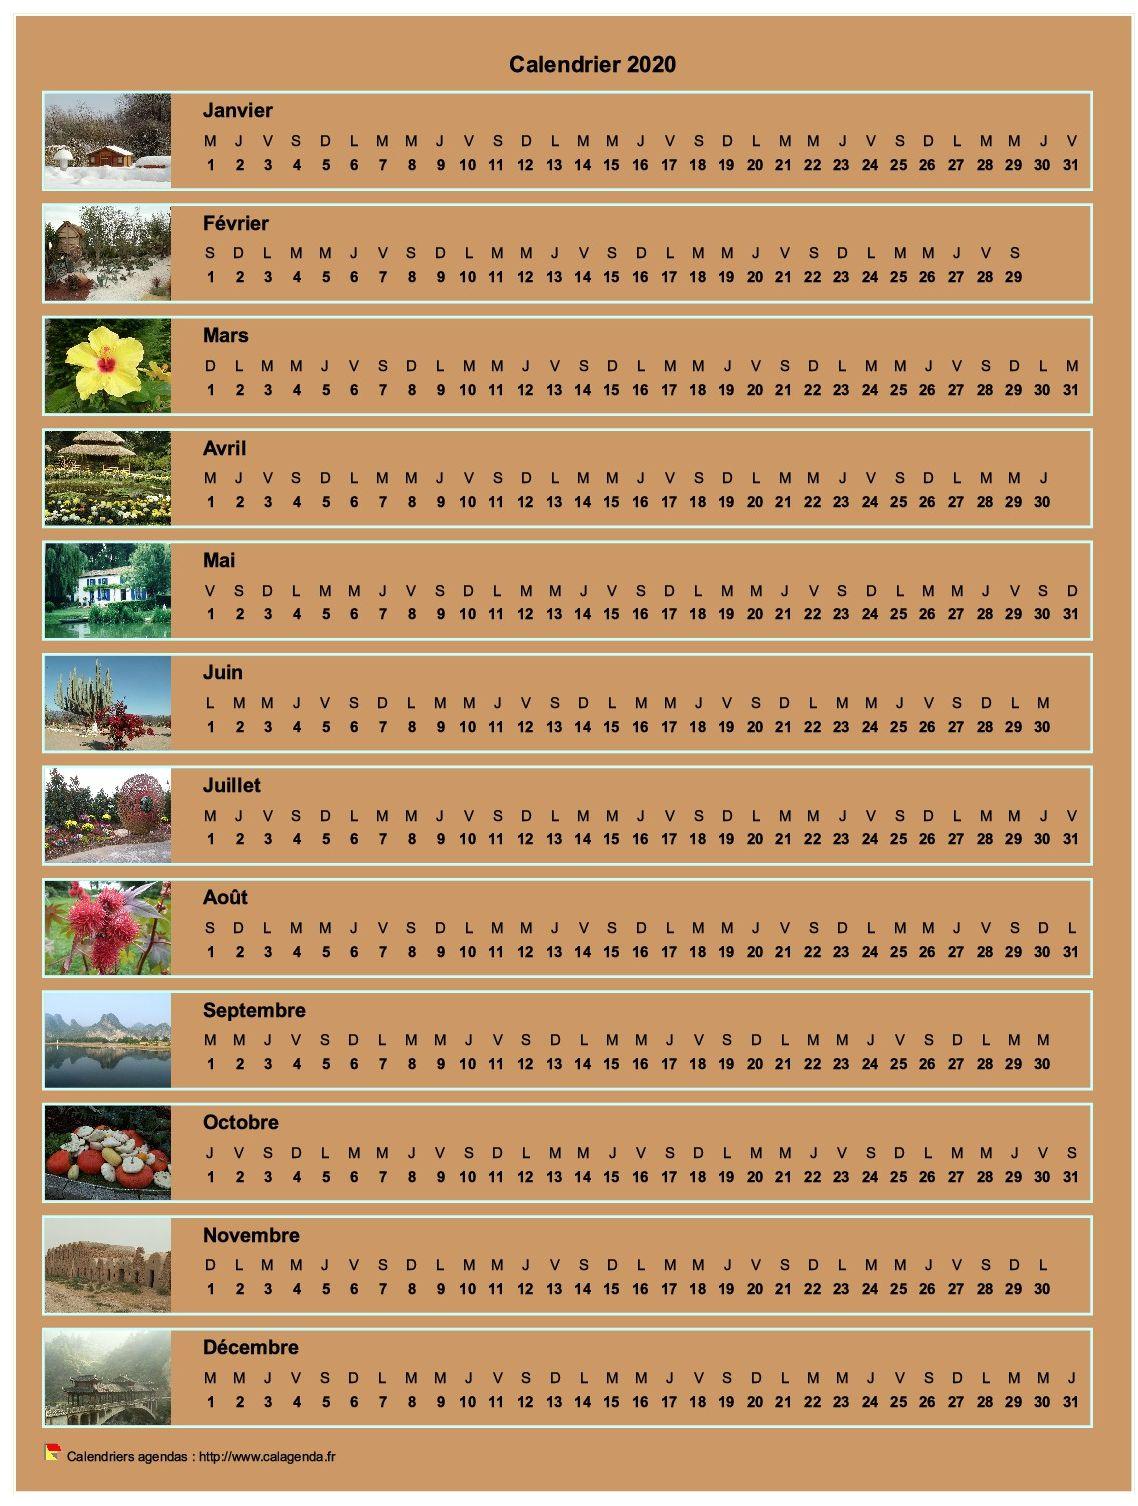 Calendrier 2020 annuel horizontal avec 12 photos